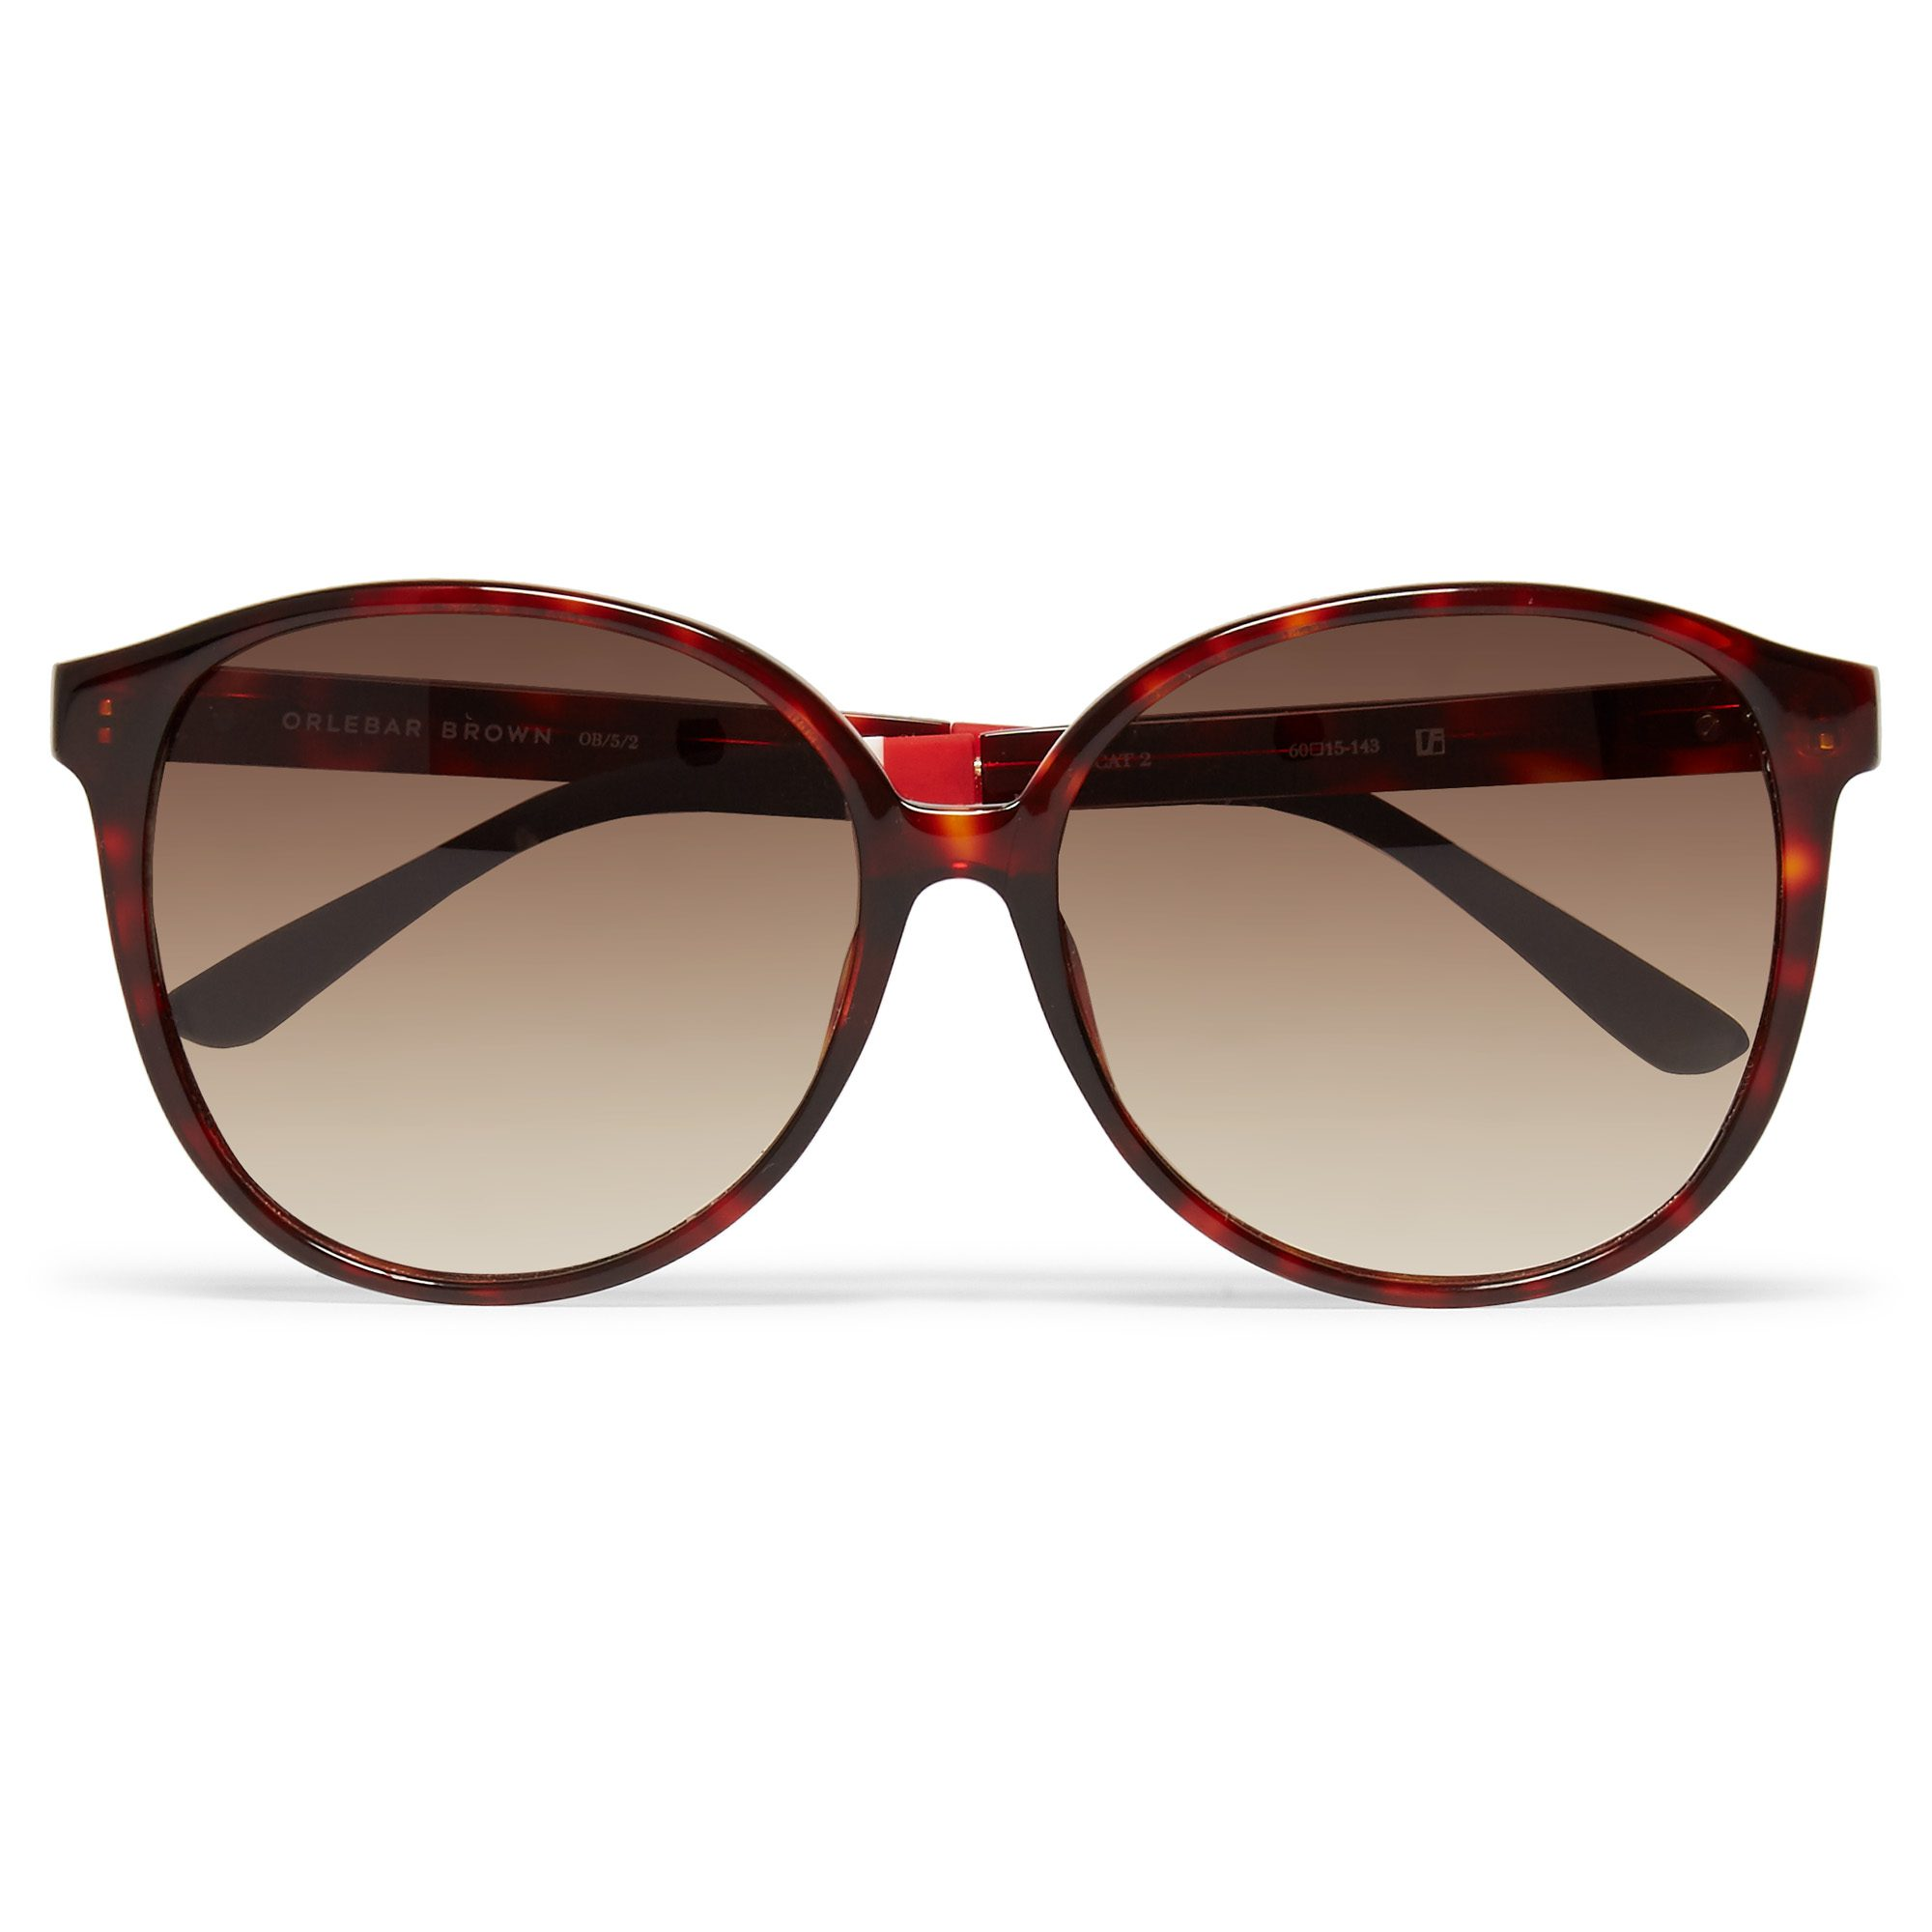 Orlebar-Brown-Spring-2016-Sunglasses_QUINN_OB5C2SUN_OCHRE T-SHELL_BROWN GRADIENT_NAVY.jpg